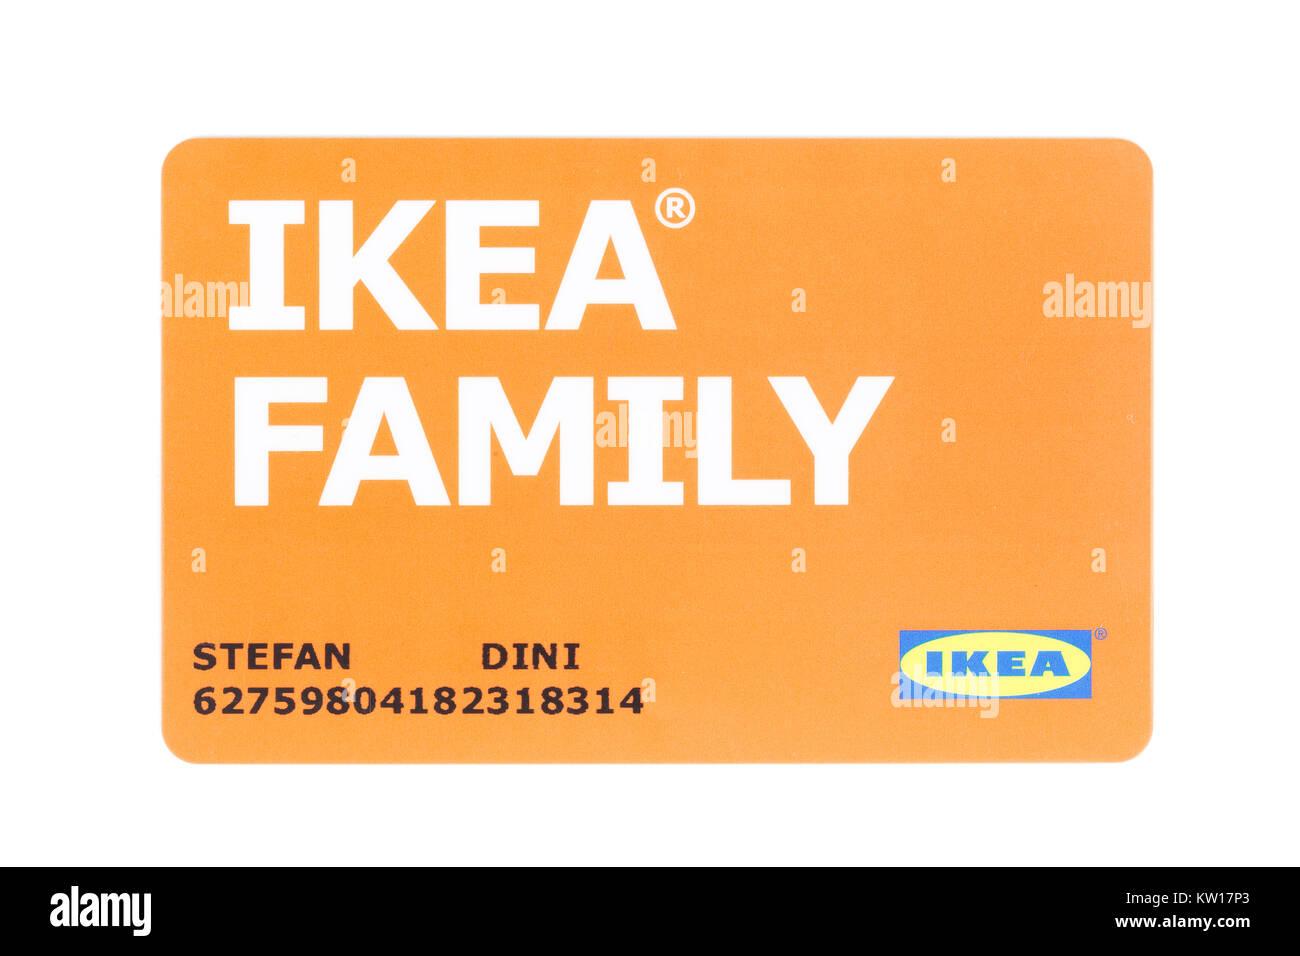 Ikea Family Card Stock Photo 170287771 Alamy